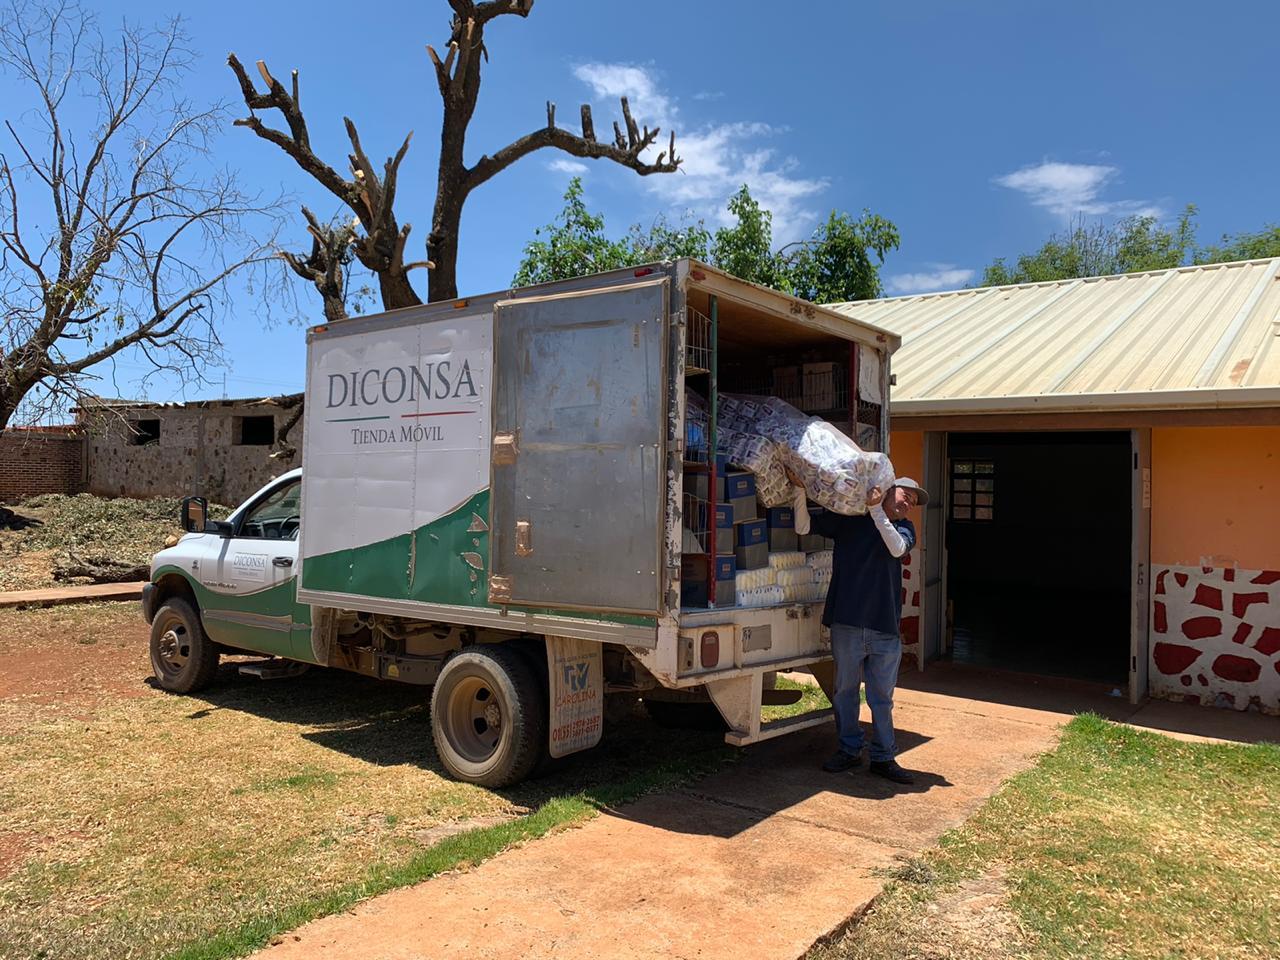 Acuerda Diconsa venta de despensas con autoridades educativas de Zacatecas